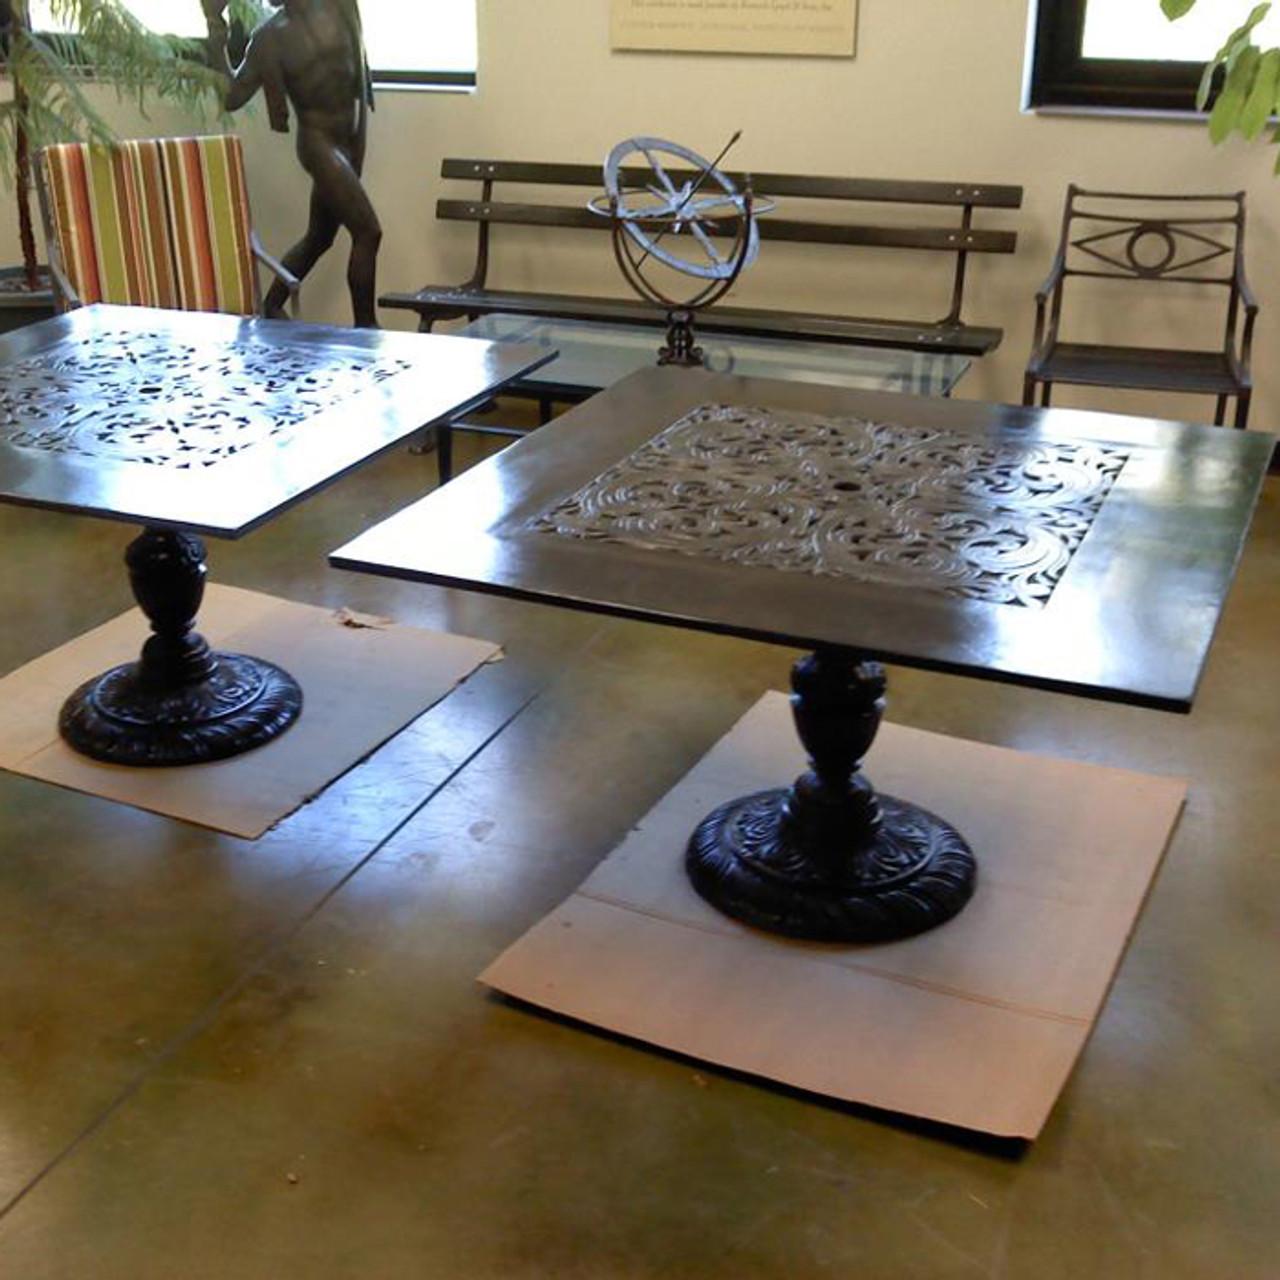 Tremendous Filigree Design 48 Square Dining Table With Pedestal Leg Interior Design Ideas Clesiryabchikinfo